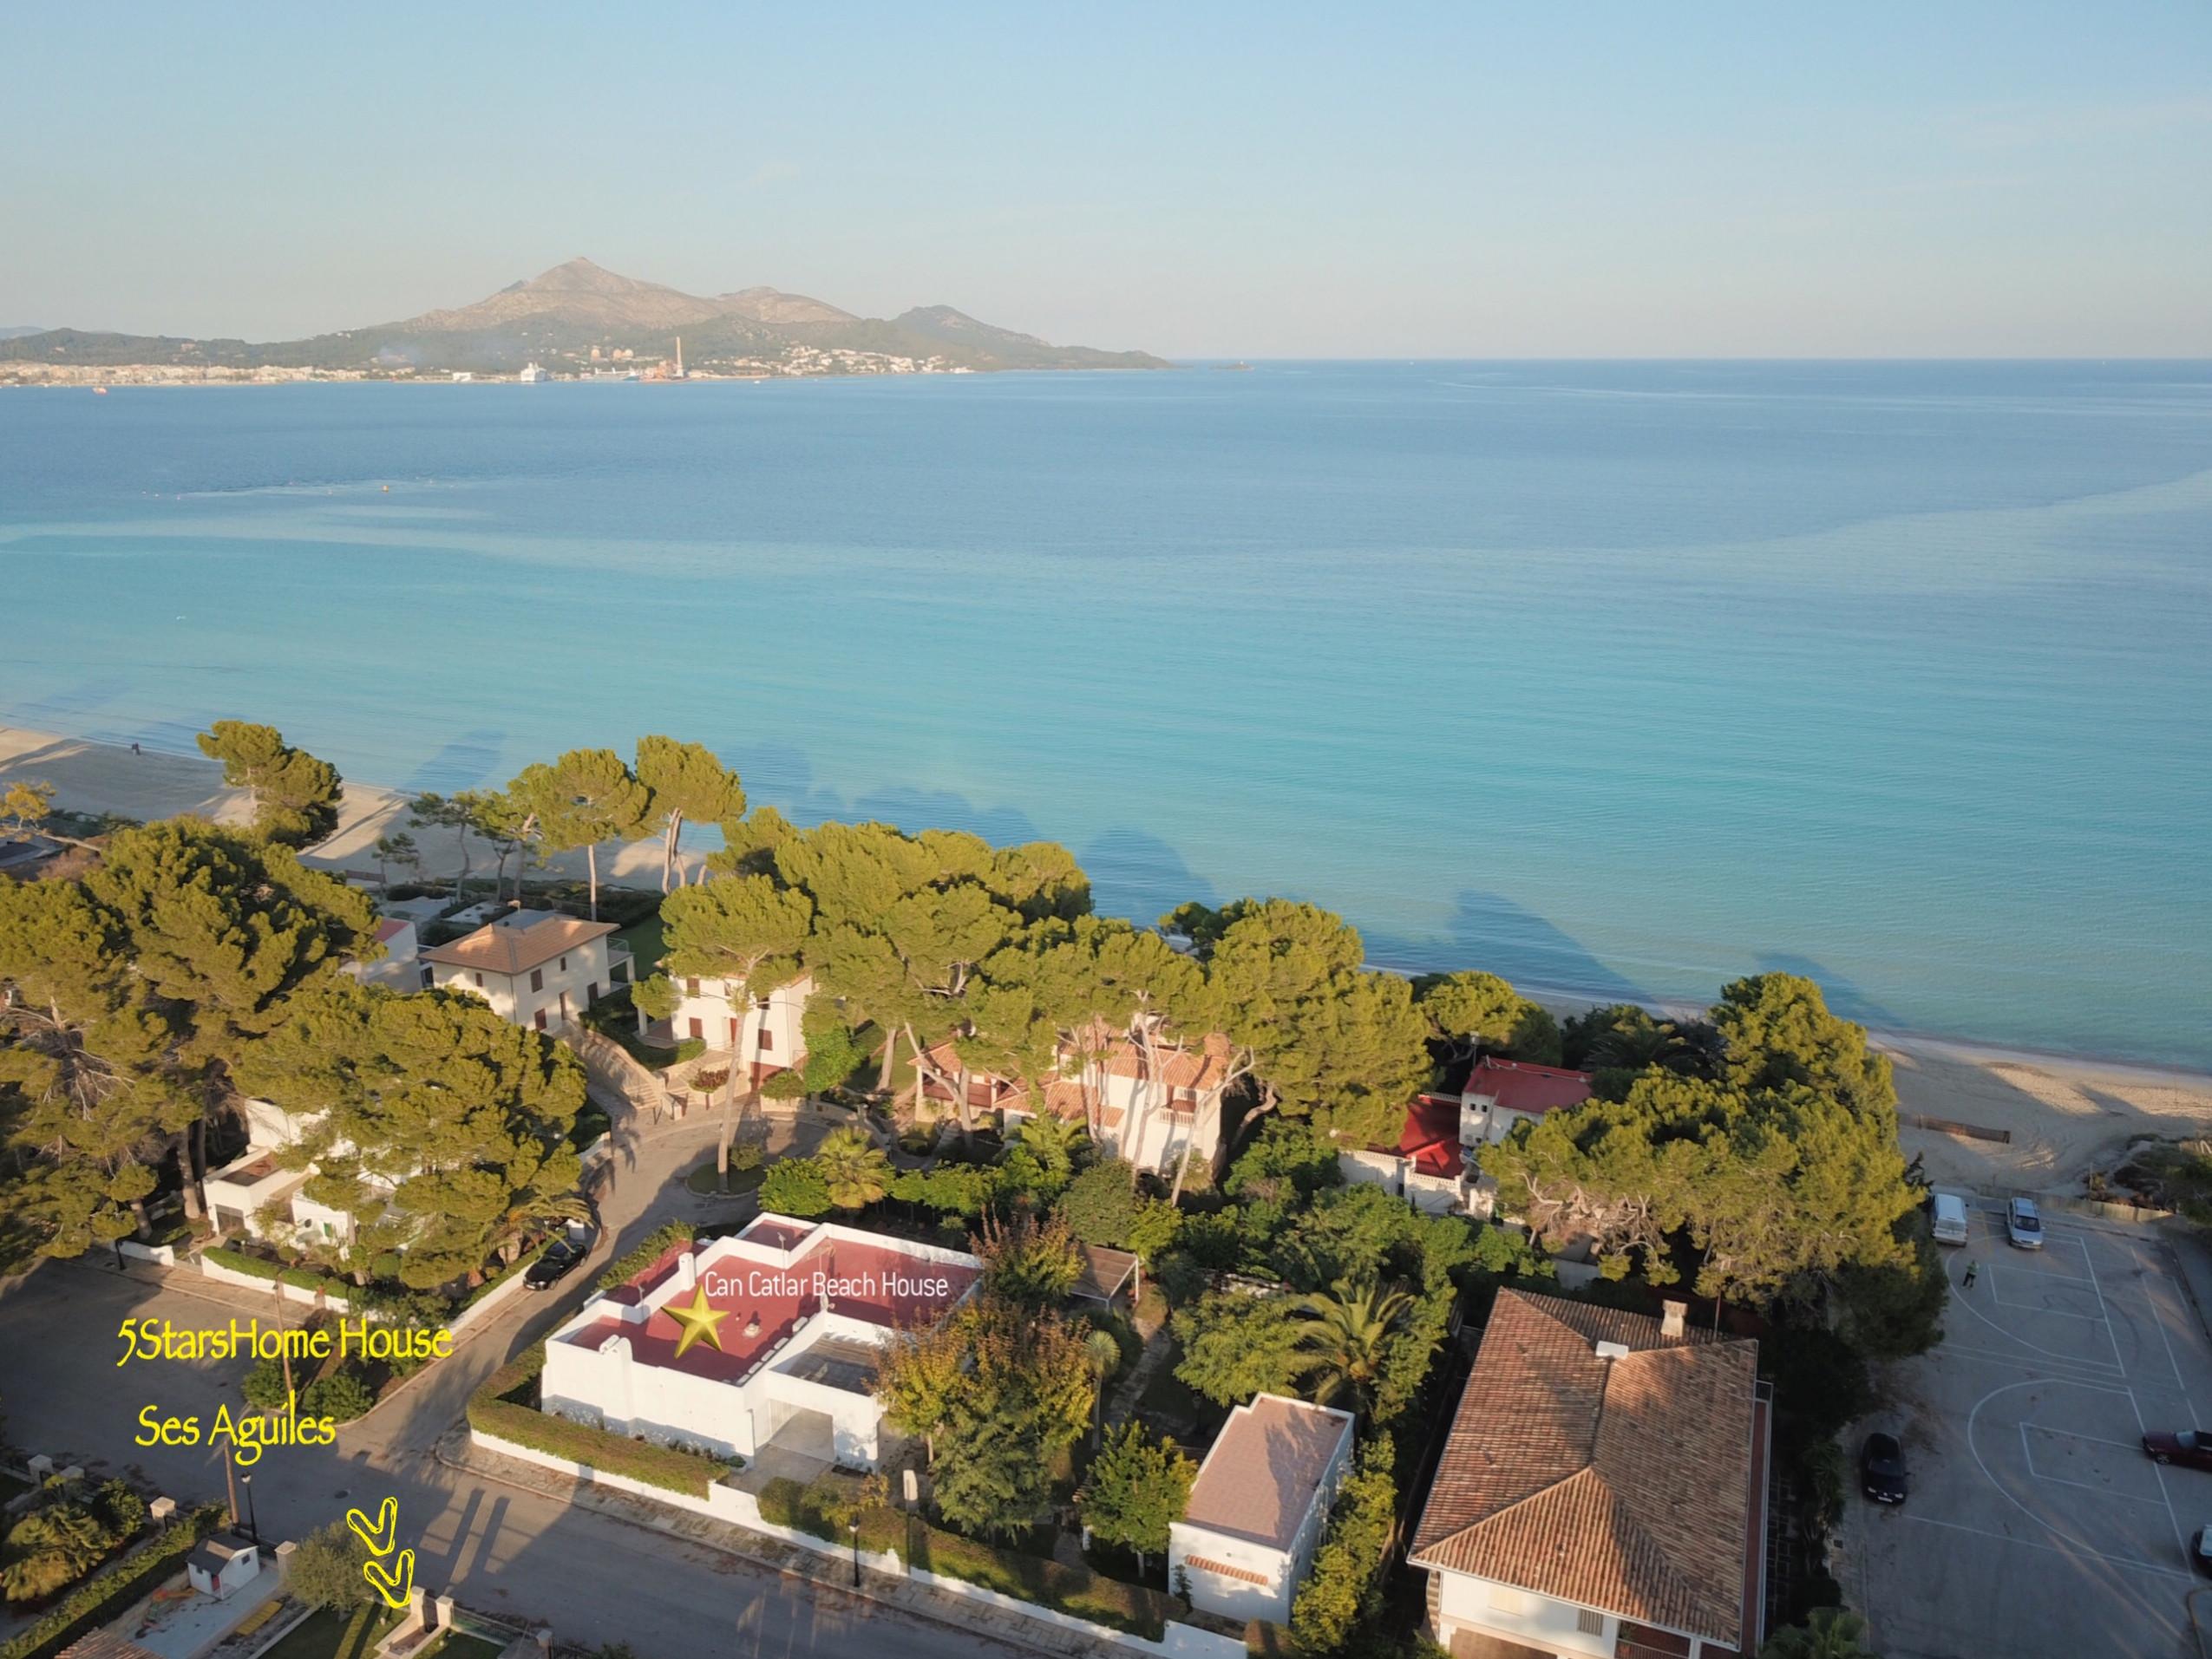 in Platja de Muro - Aguiles 7 ,Beach House 5StarsHome Mallorca